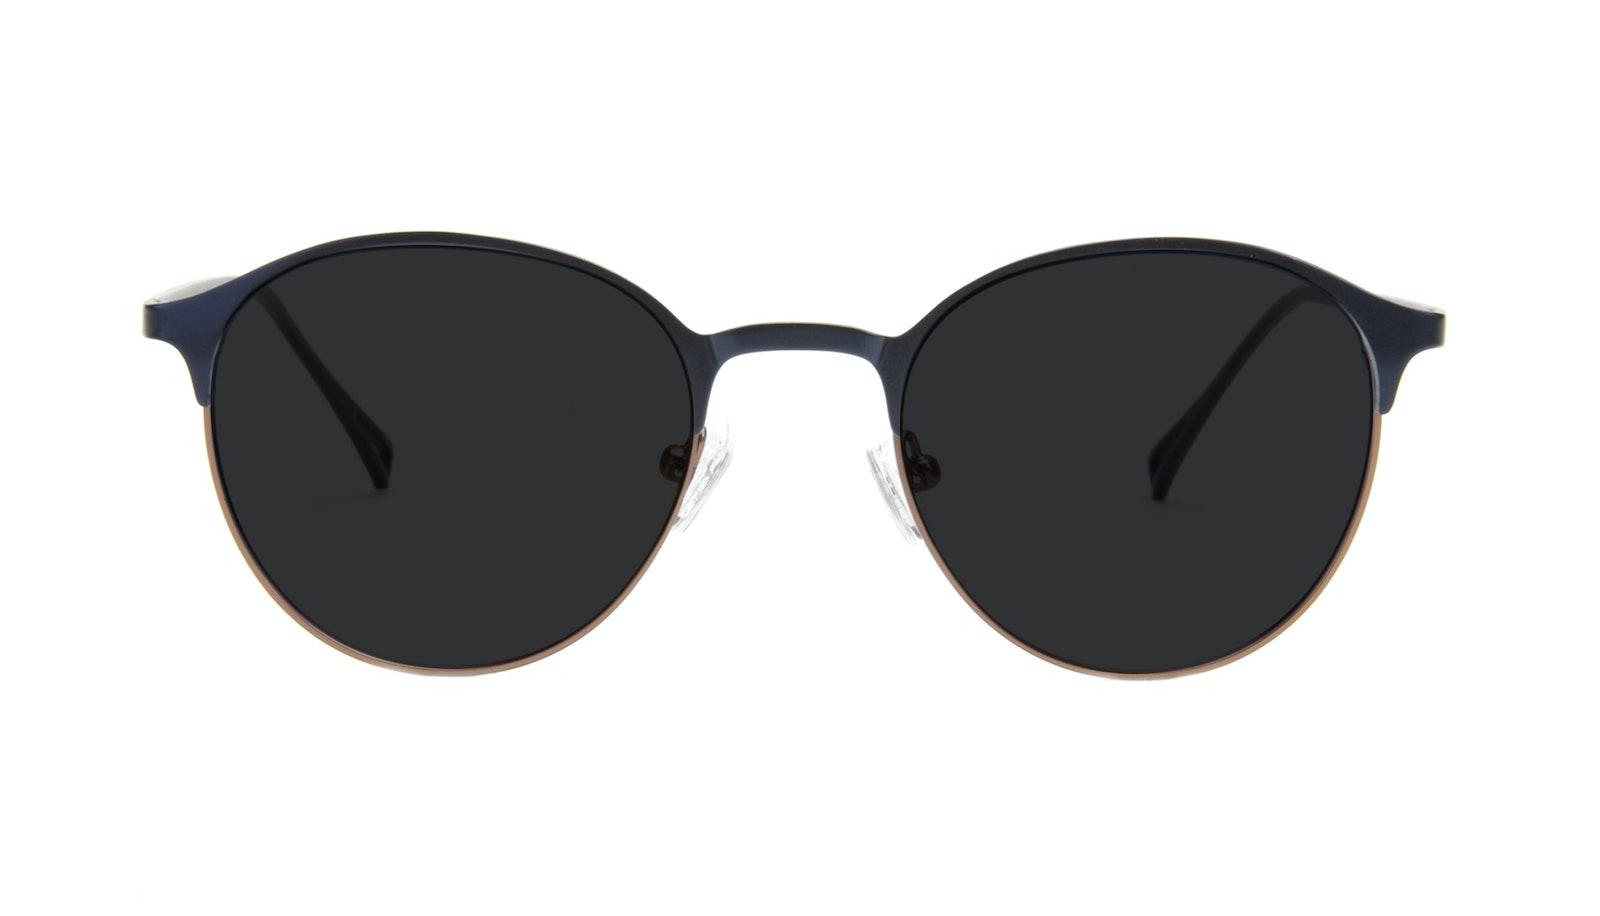 Affordable Fashion Glasses Round Sunglasses Women Bay Marine